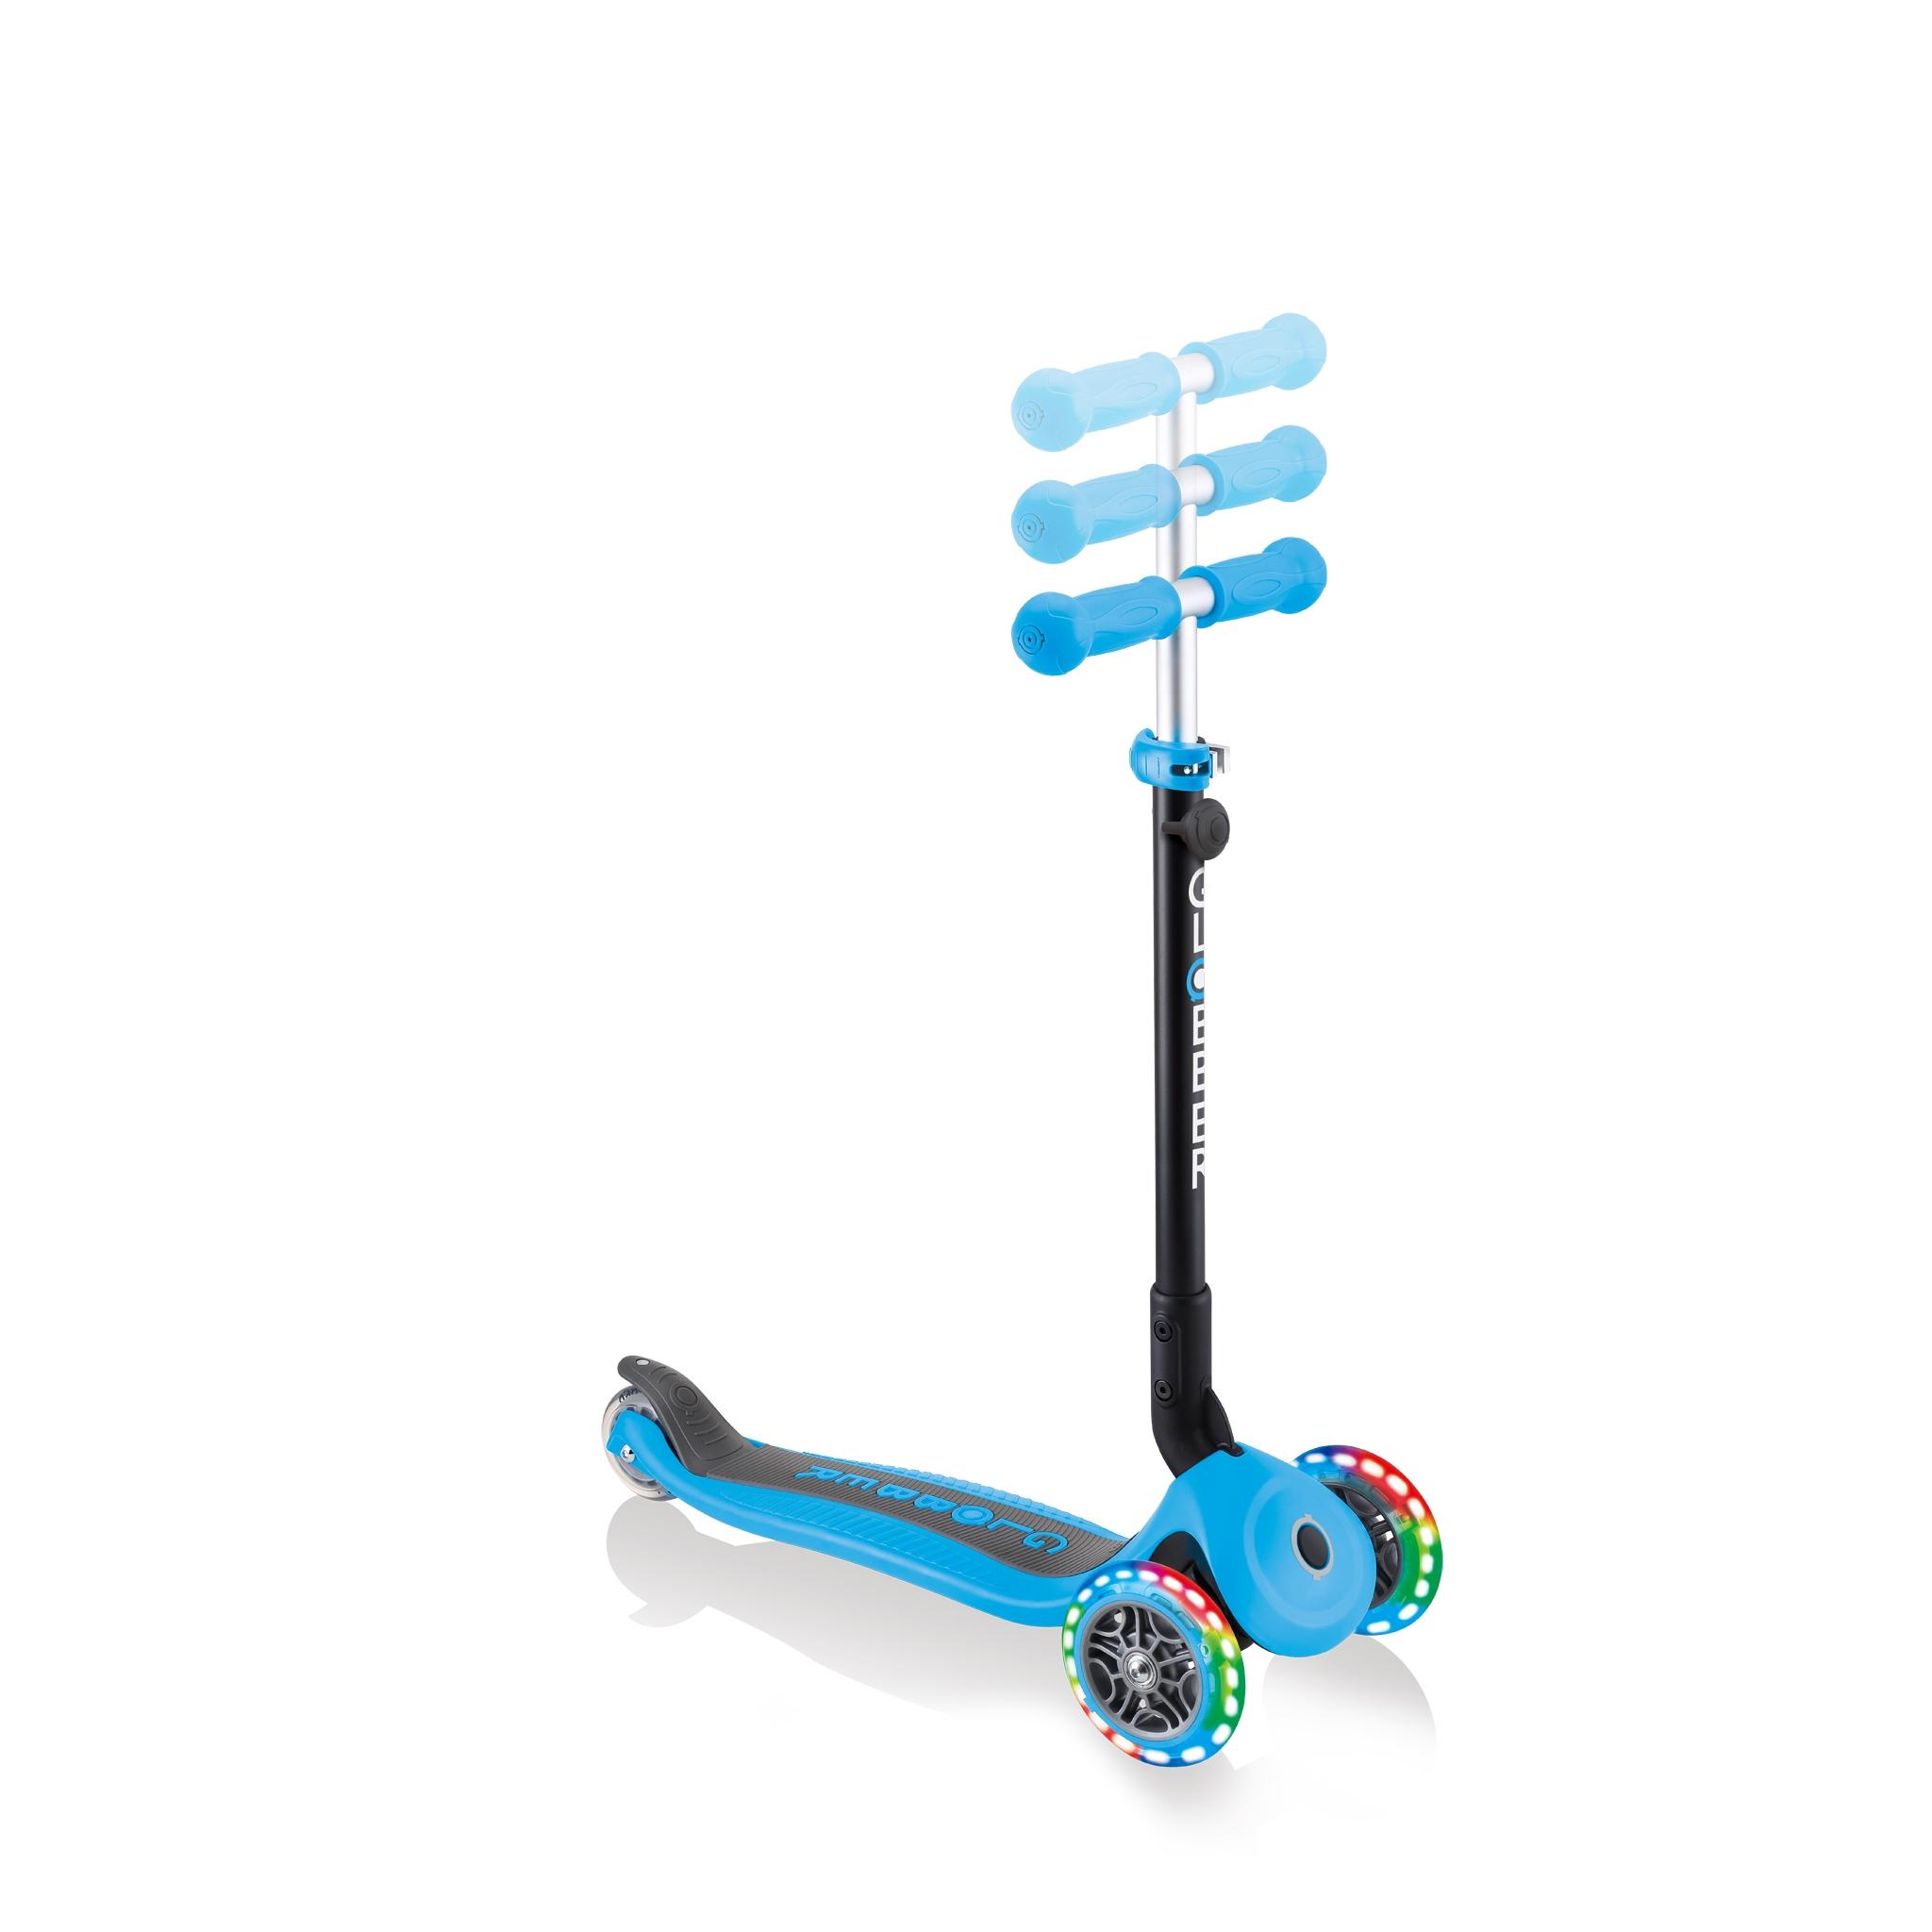 Globber-GO-UP-FOLDABLE-PLUS-LIGHTS-adjustable-light-up-scooter-for-toddlers 4